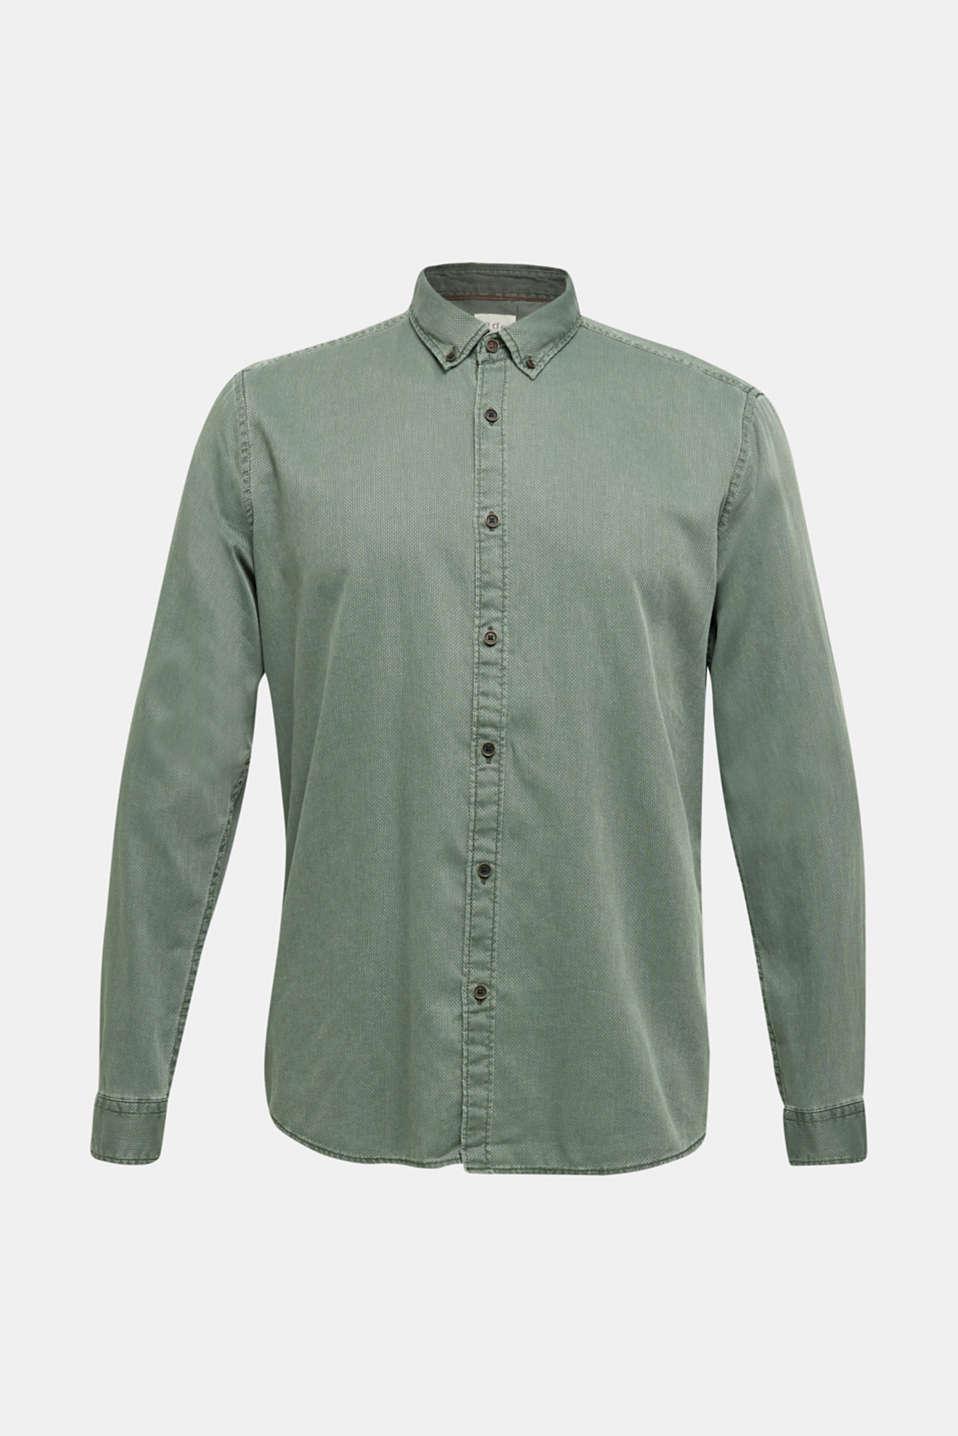 Shirts woven Slim fit, KHAKI GREEN 5, detail image number 8